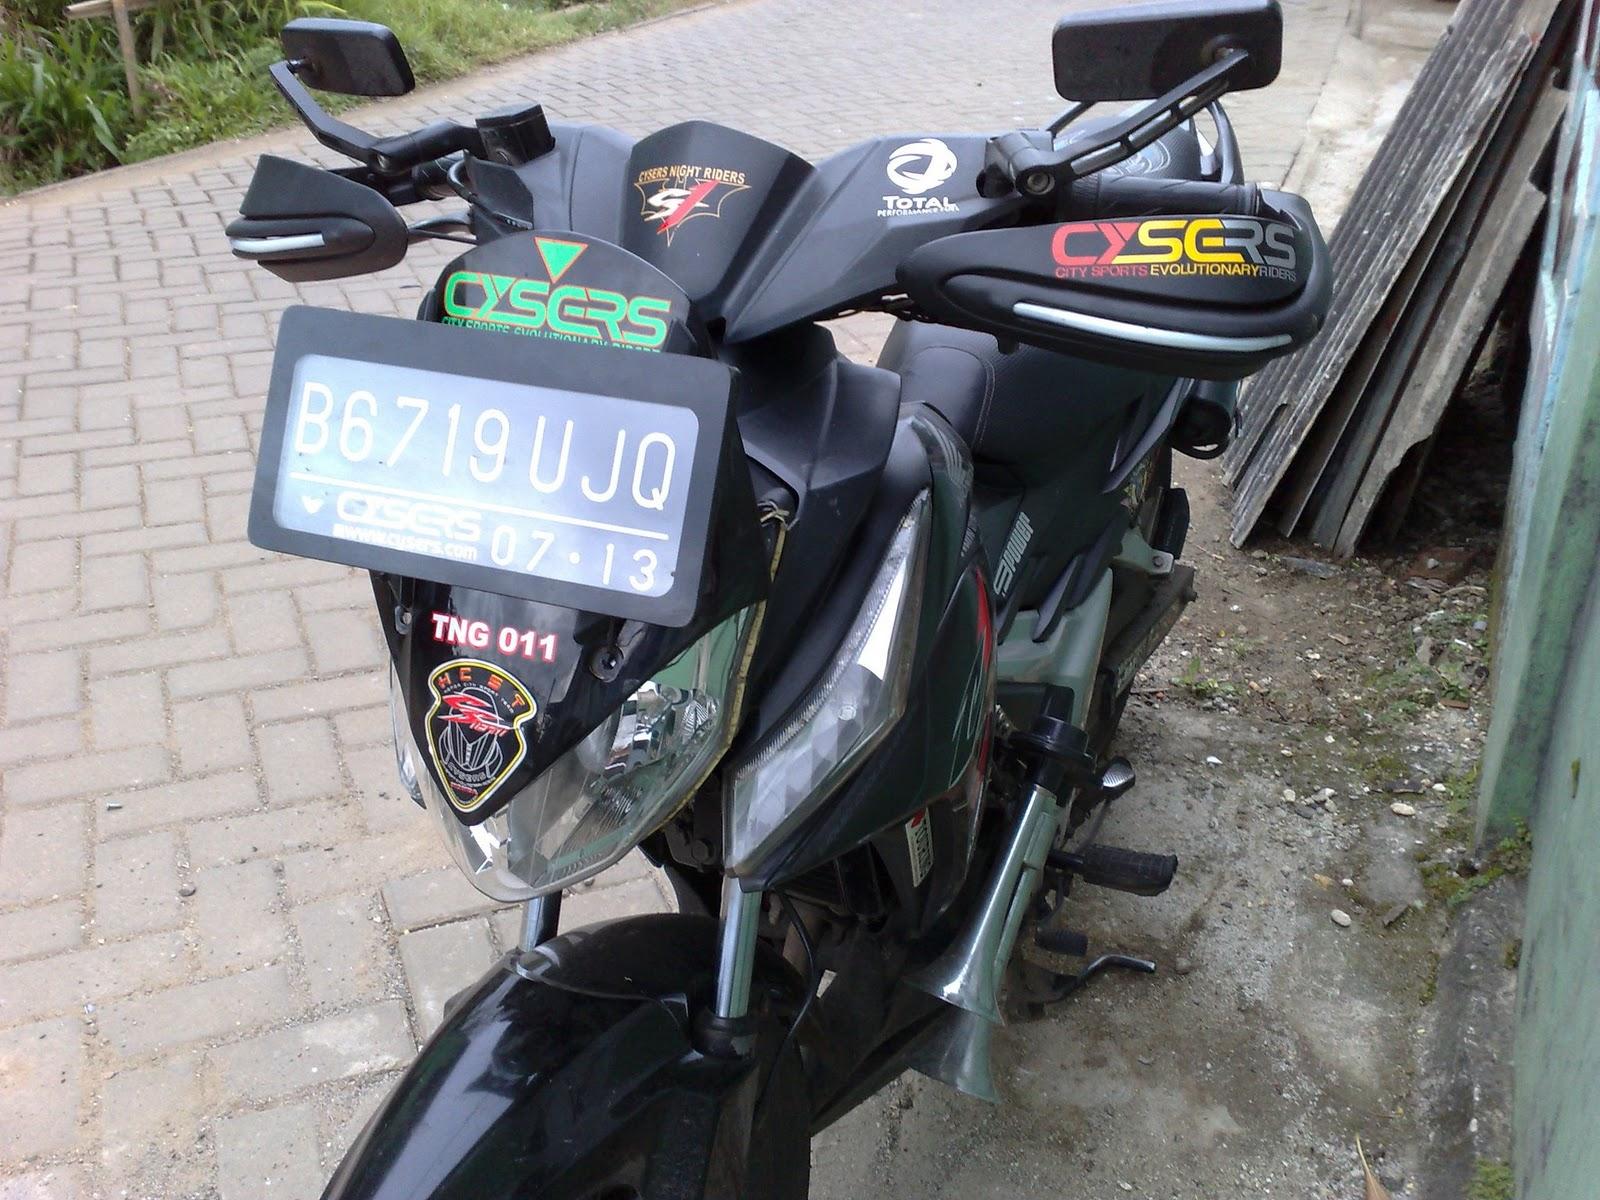 Honda City Sport Team Indonesia Selamat Datang Di Website Hcst